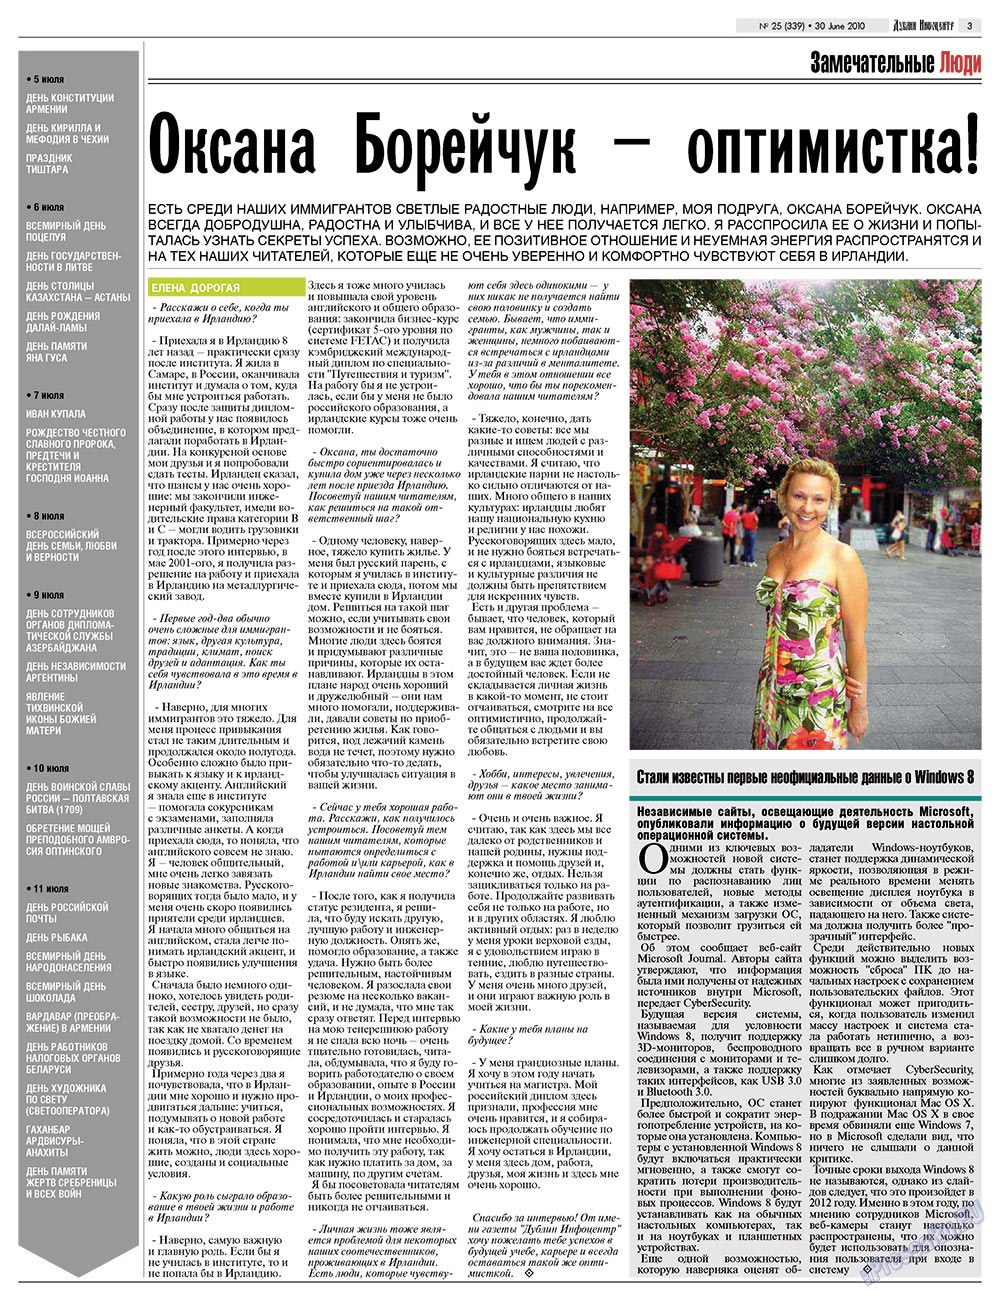 Дублин инфоцентр (газета). 2010 год, номер 25, стр. 3